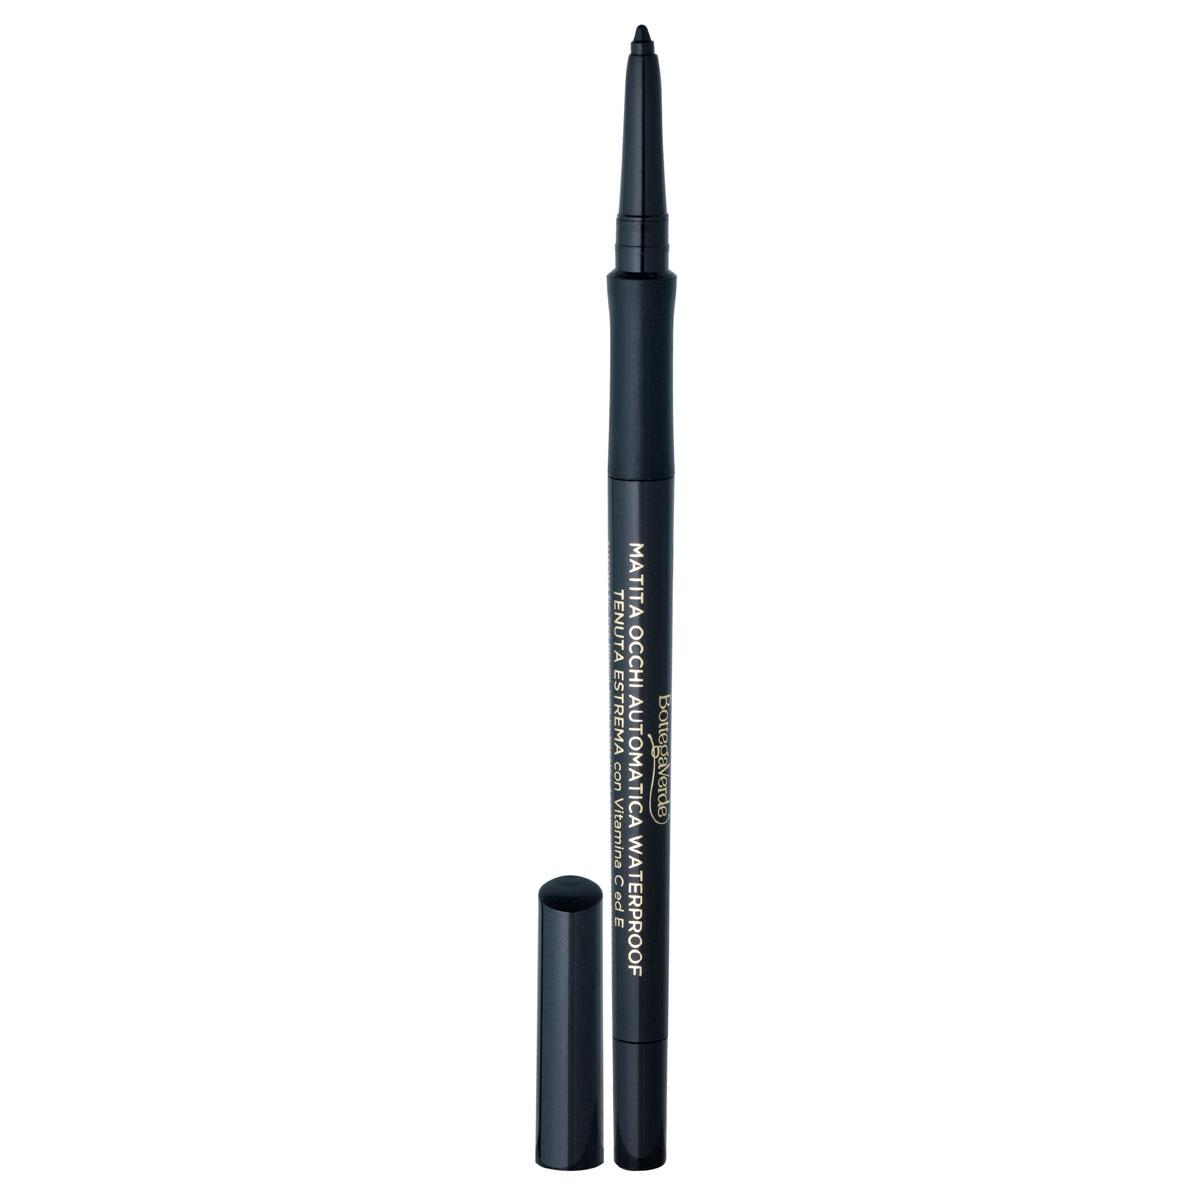 Creion de ochi waterproof, retractabil, cu vitamina C si E